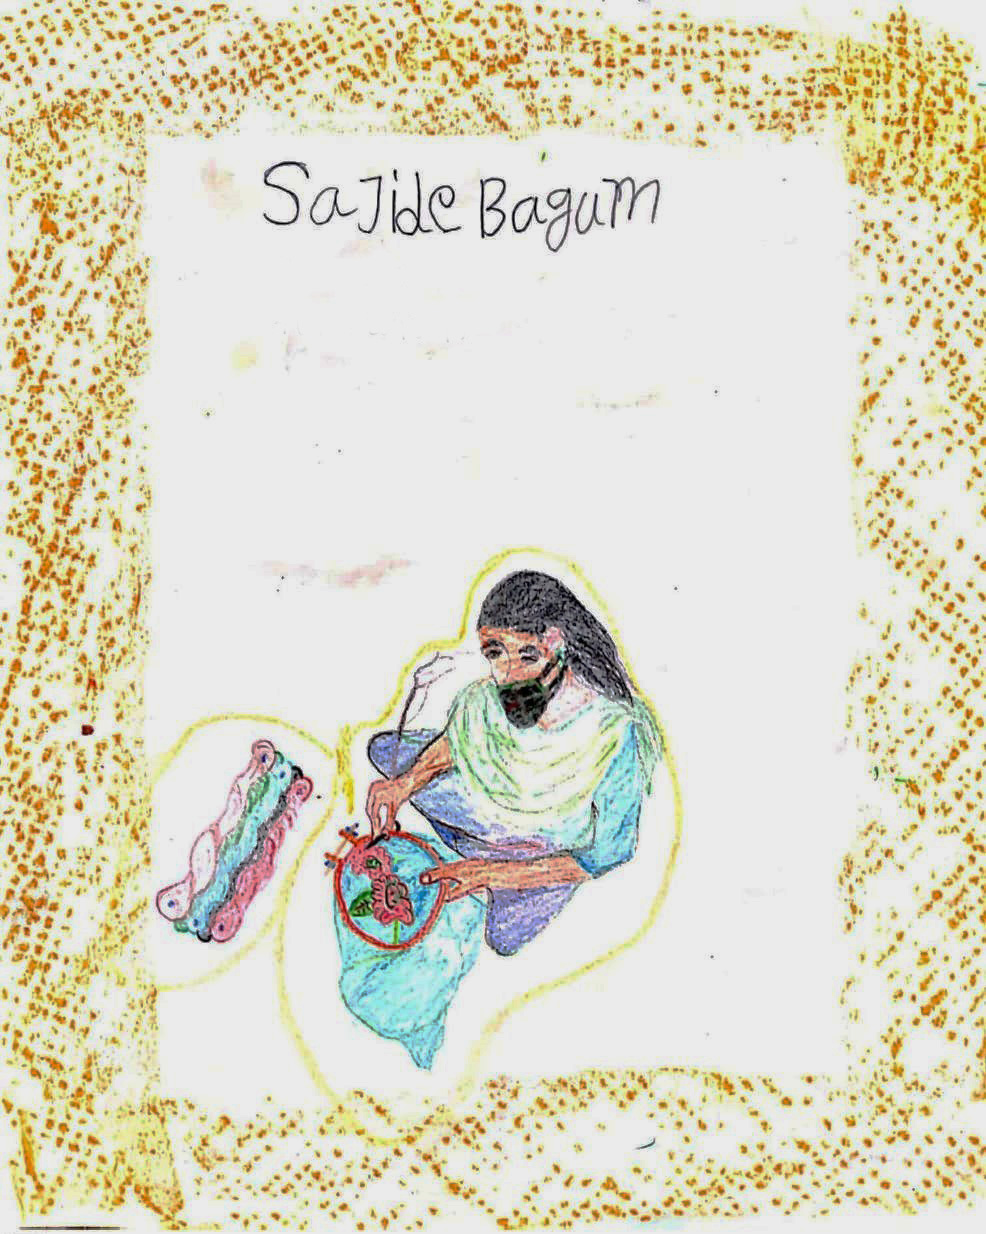 Women Life, Livelihood and Leisure, illustration by Sajide Begum